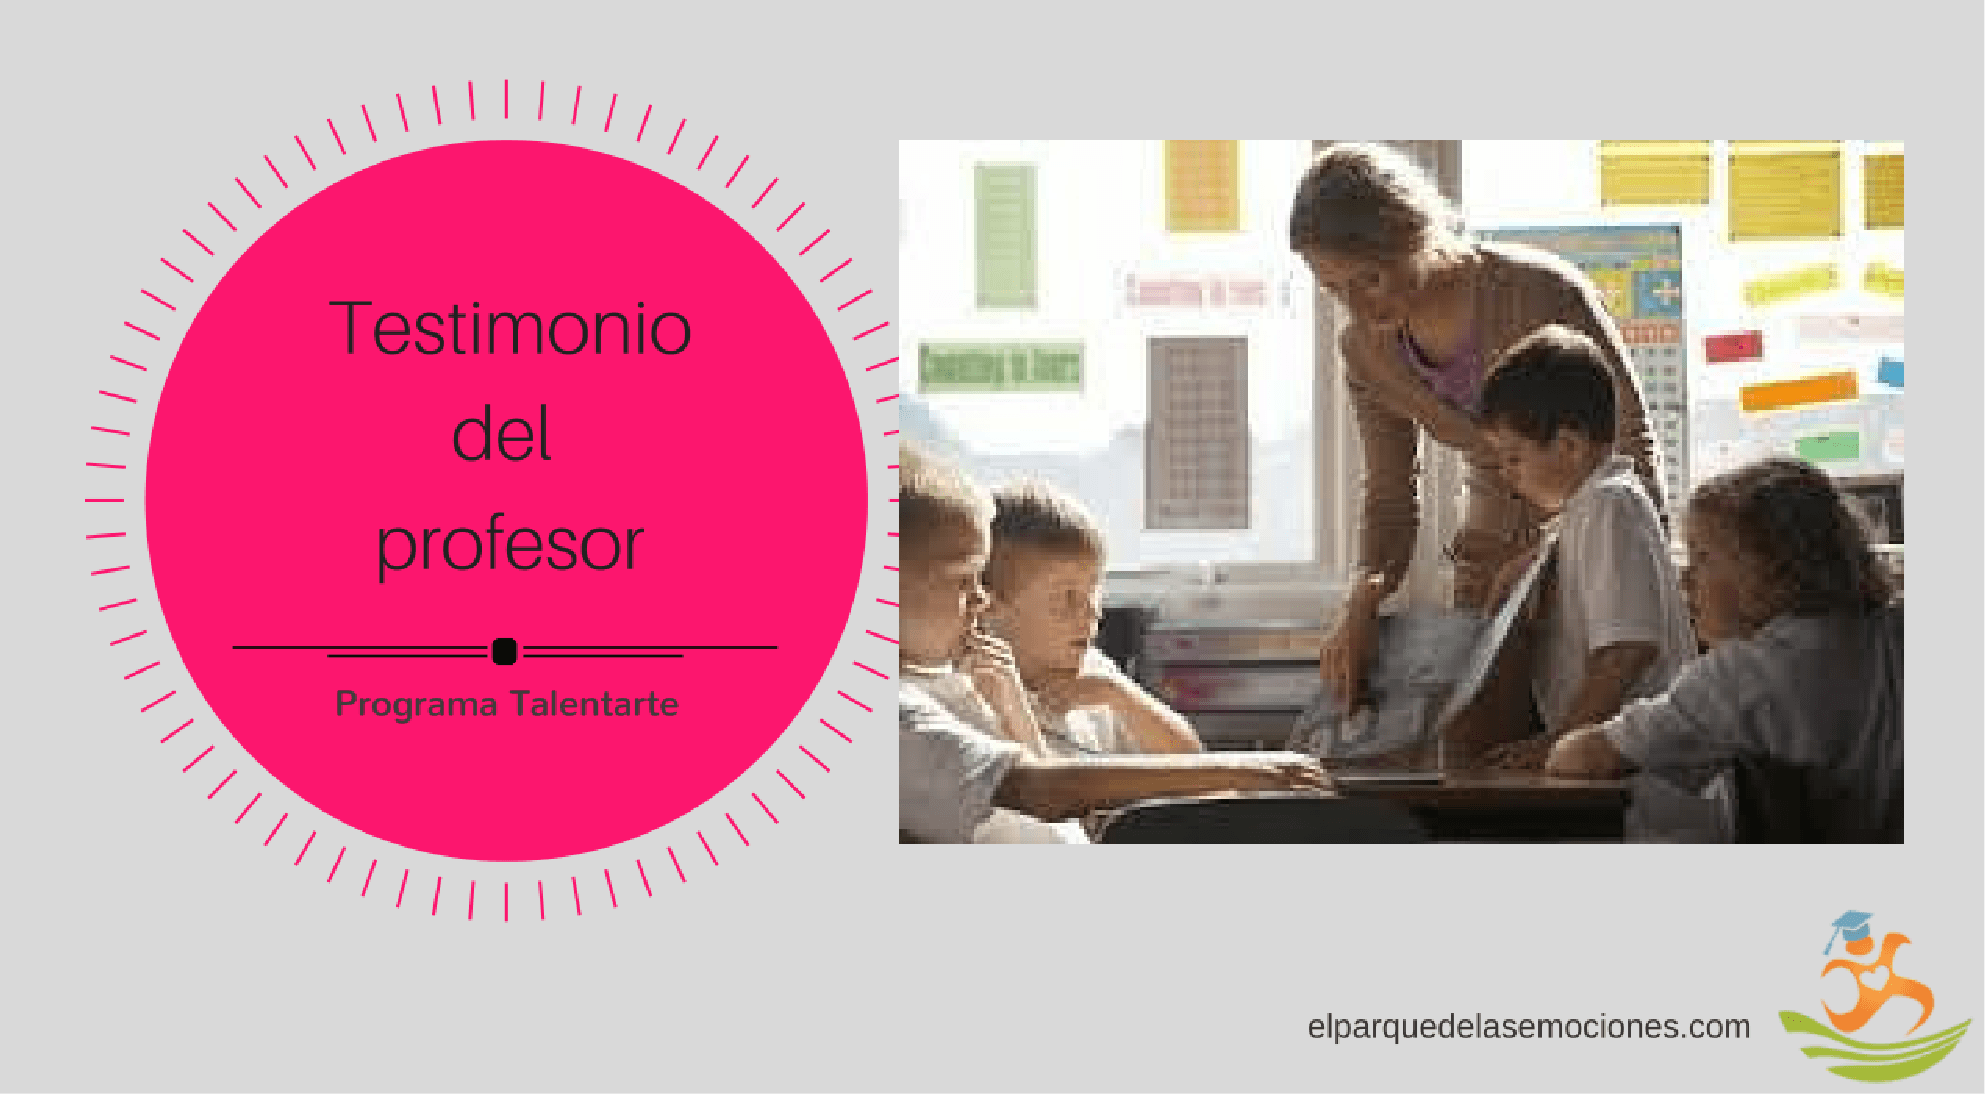 Testimonio del profesor beneficios del programa